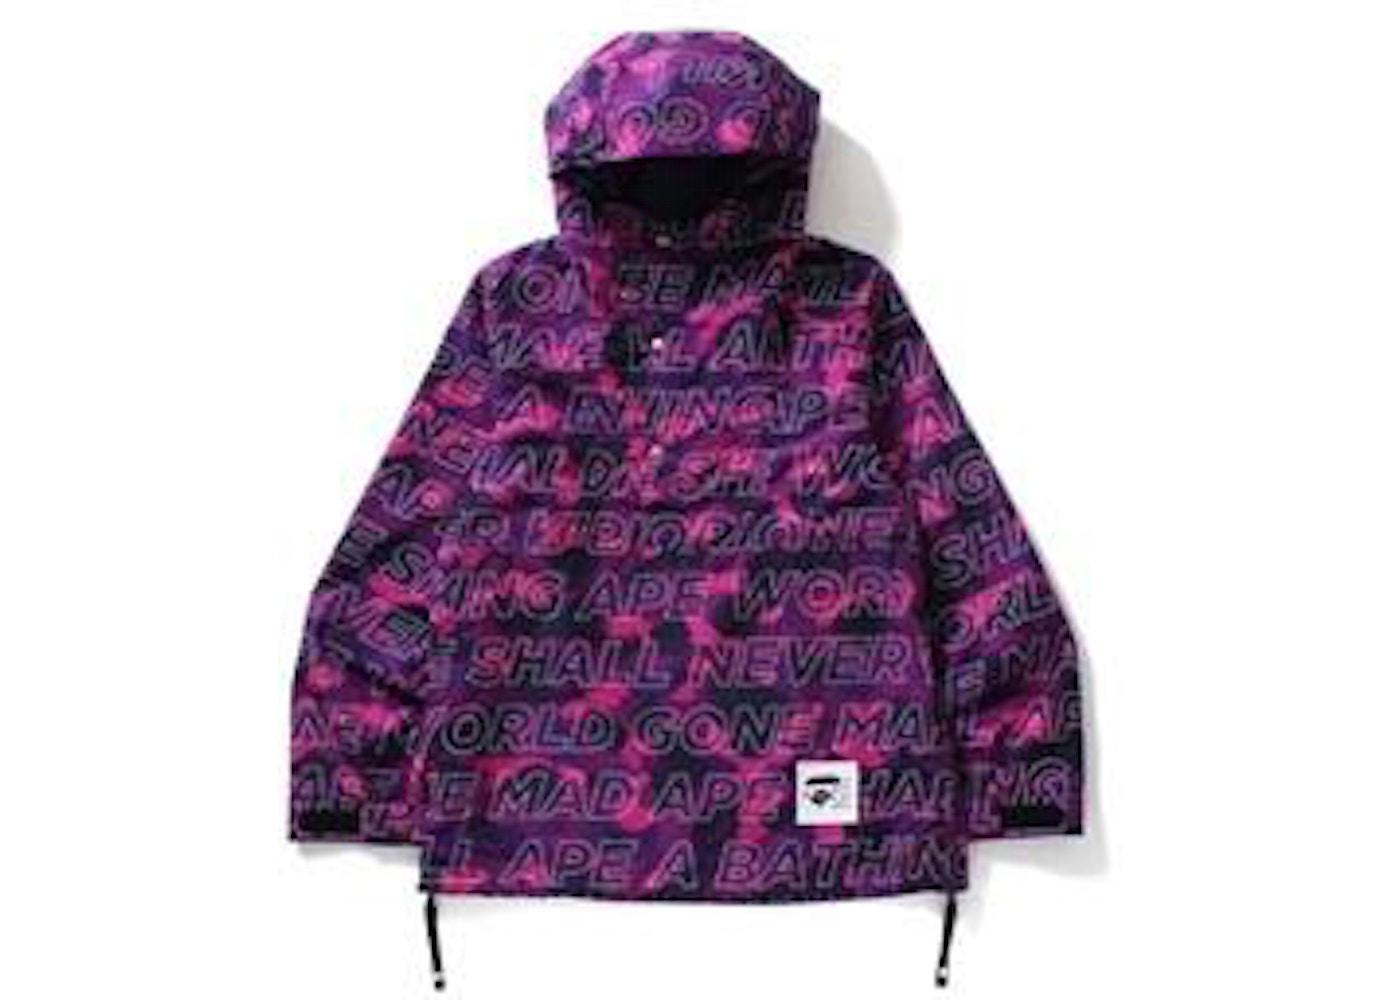 bbb1ce341cf5 BAPE Text Color Camo Pullover Hoodie Jacket Jacket Purple -